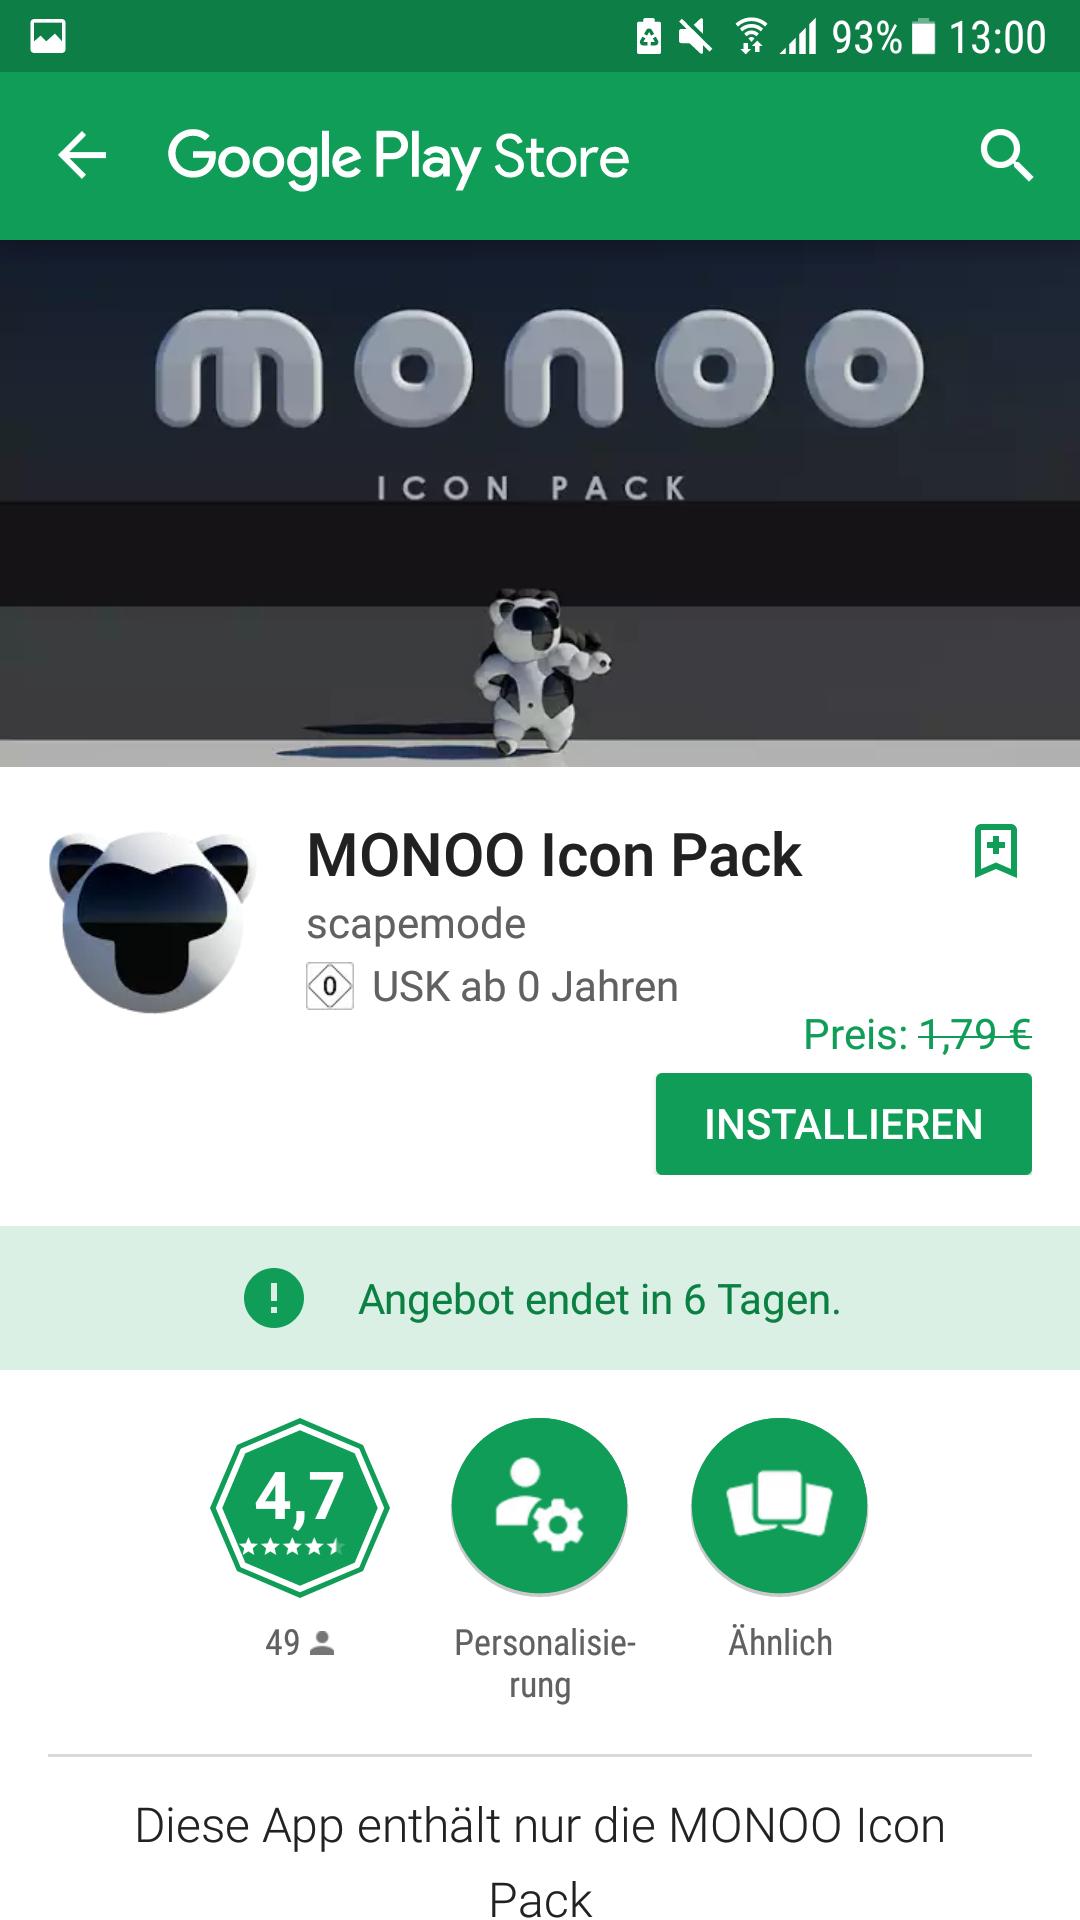 MONOO Icon Pack 0€ statt 1.79€